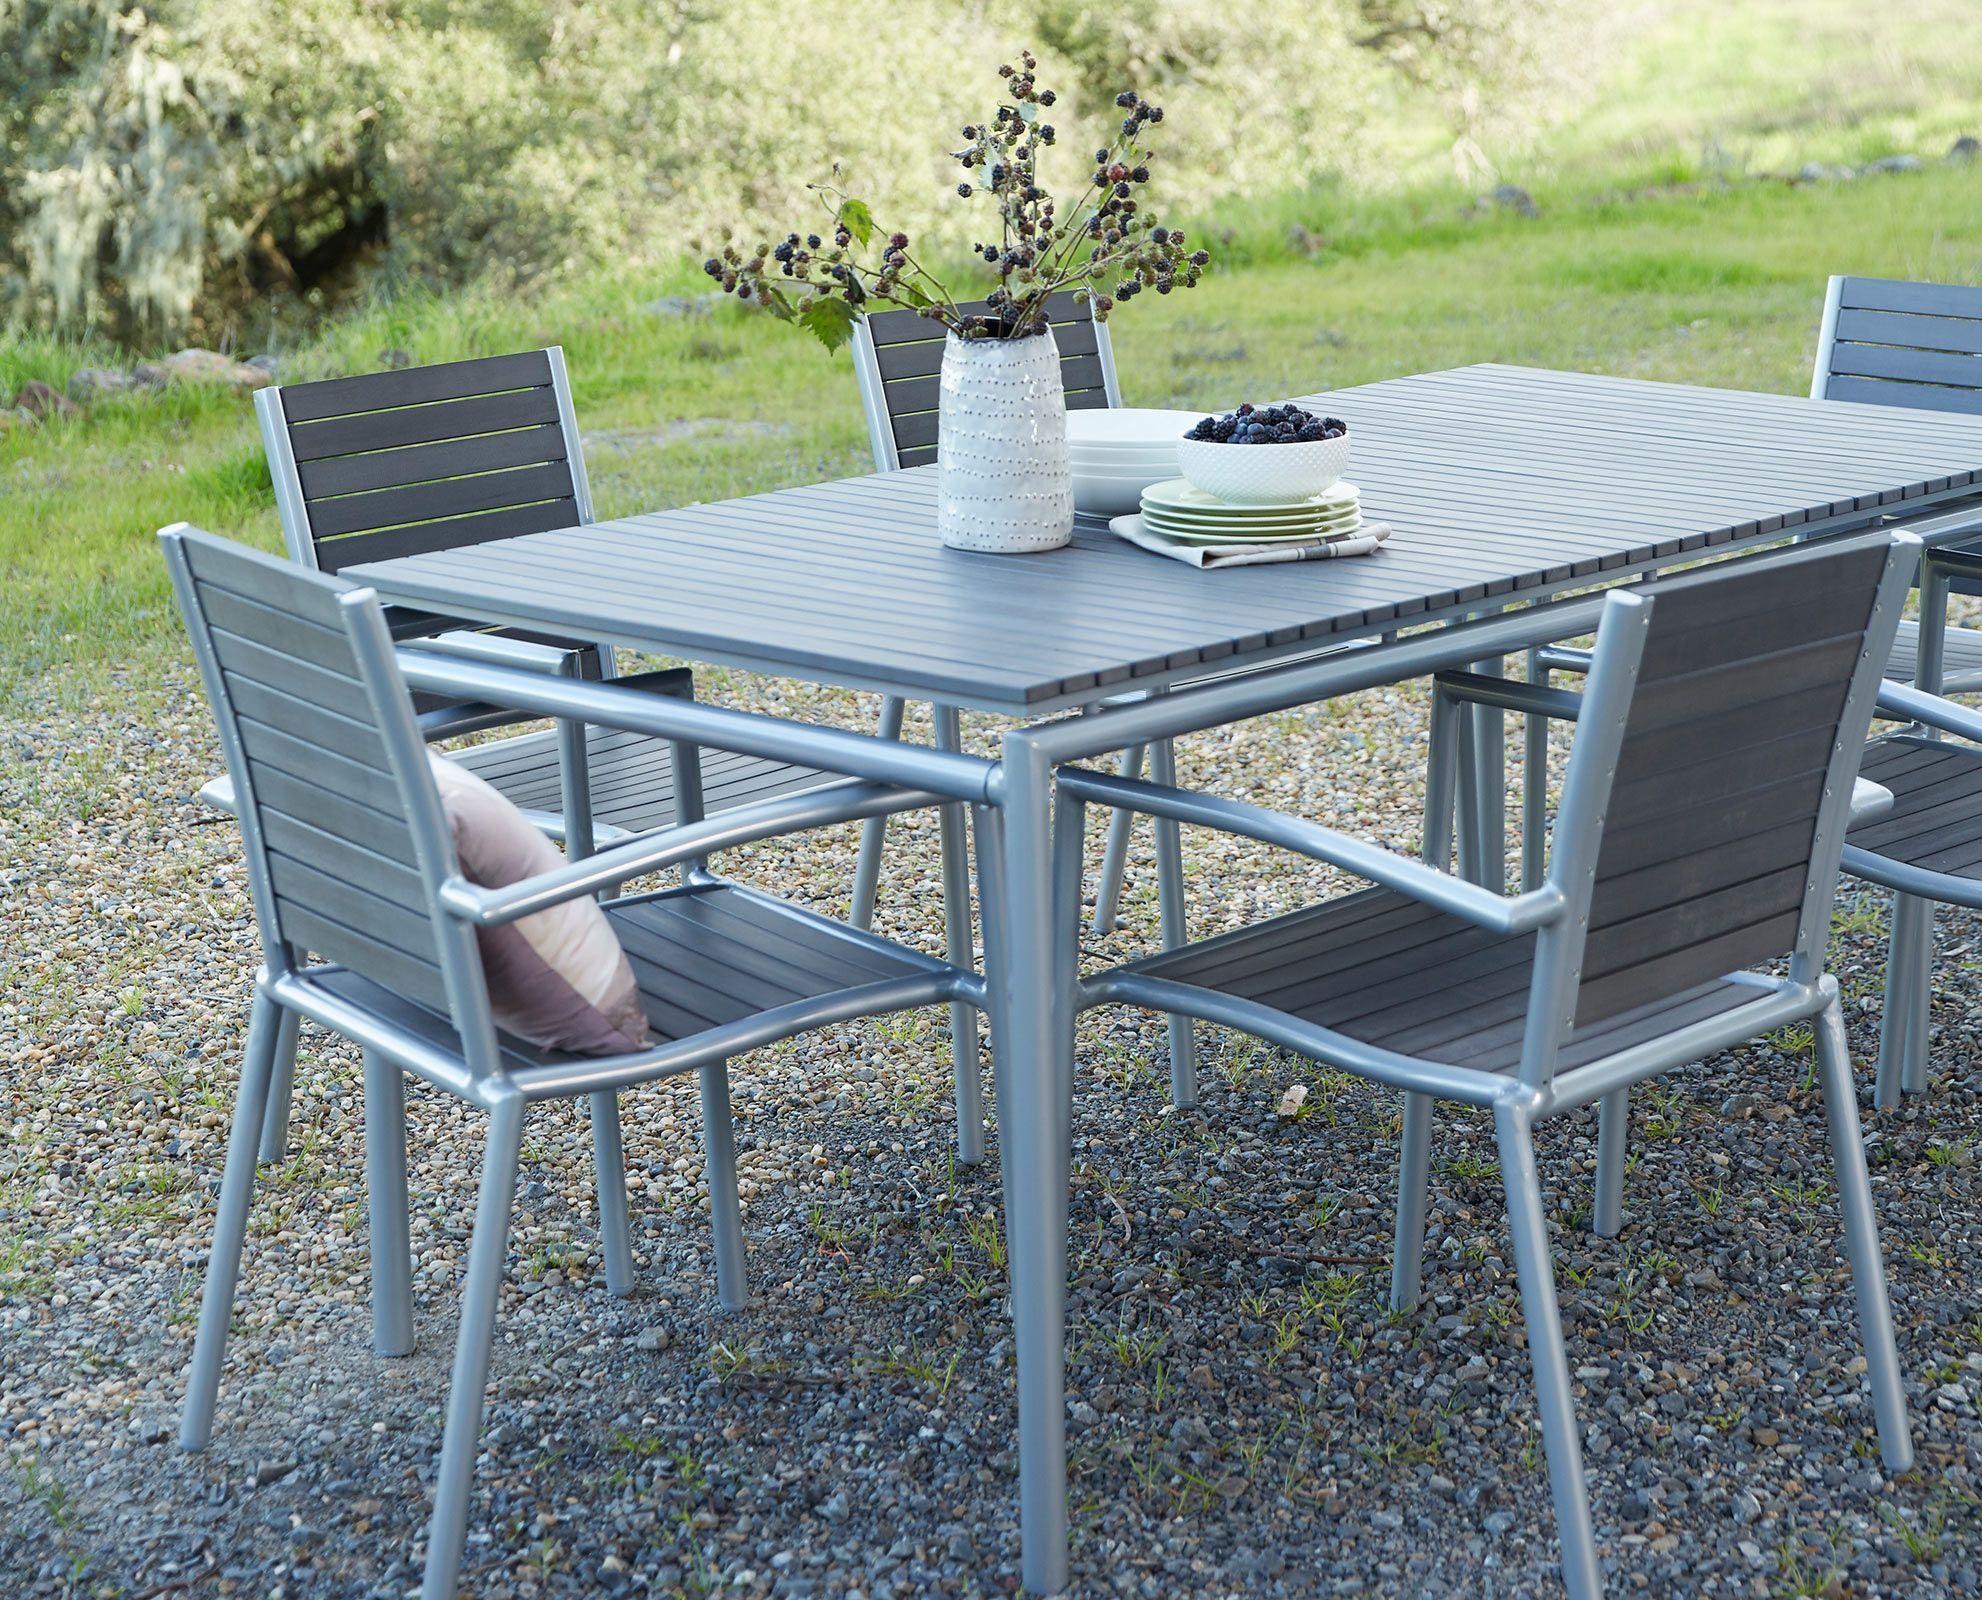 Ticari Rectangular Dining Table from Scandinavian Designs - The ...